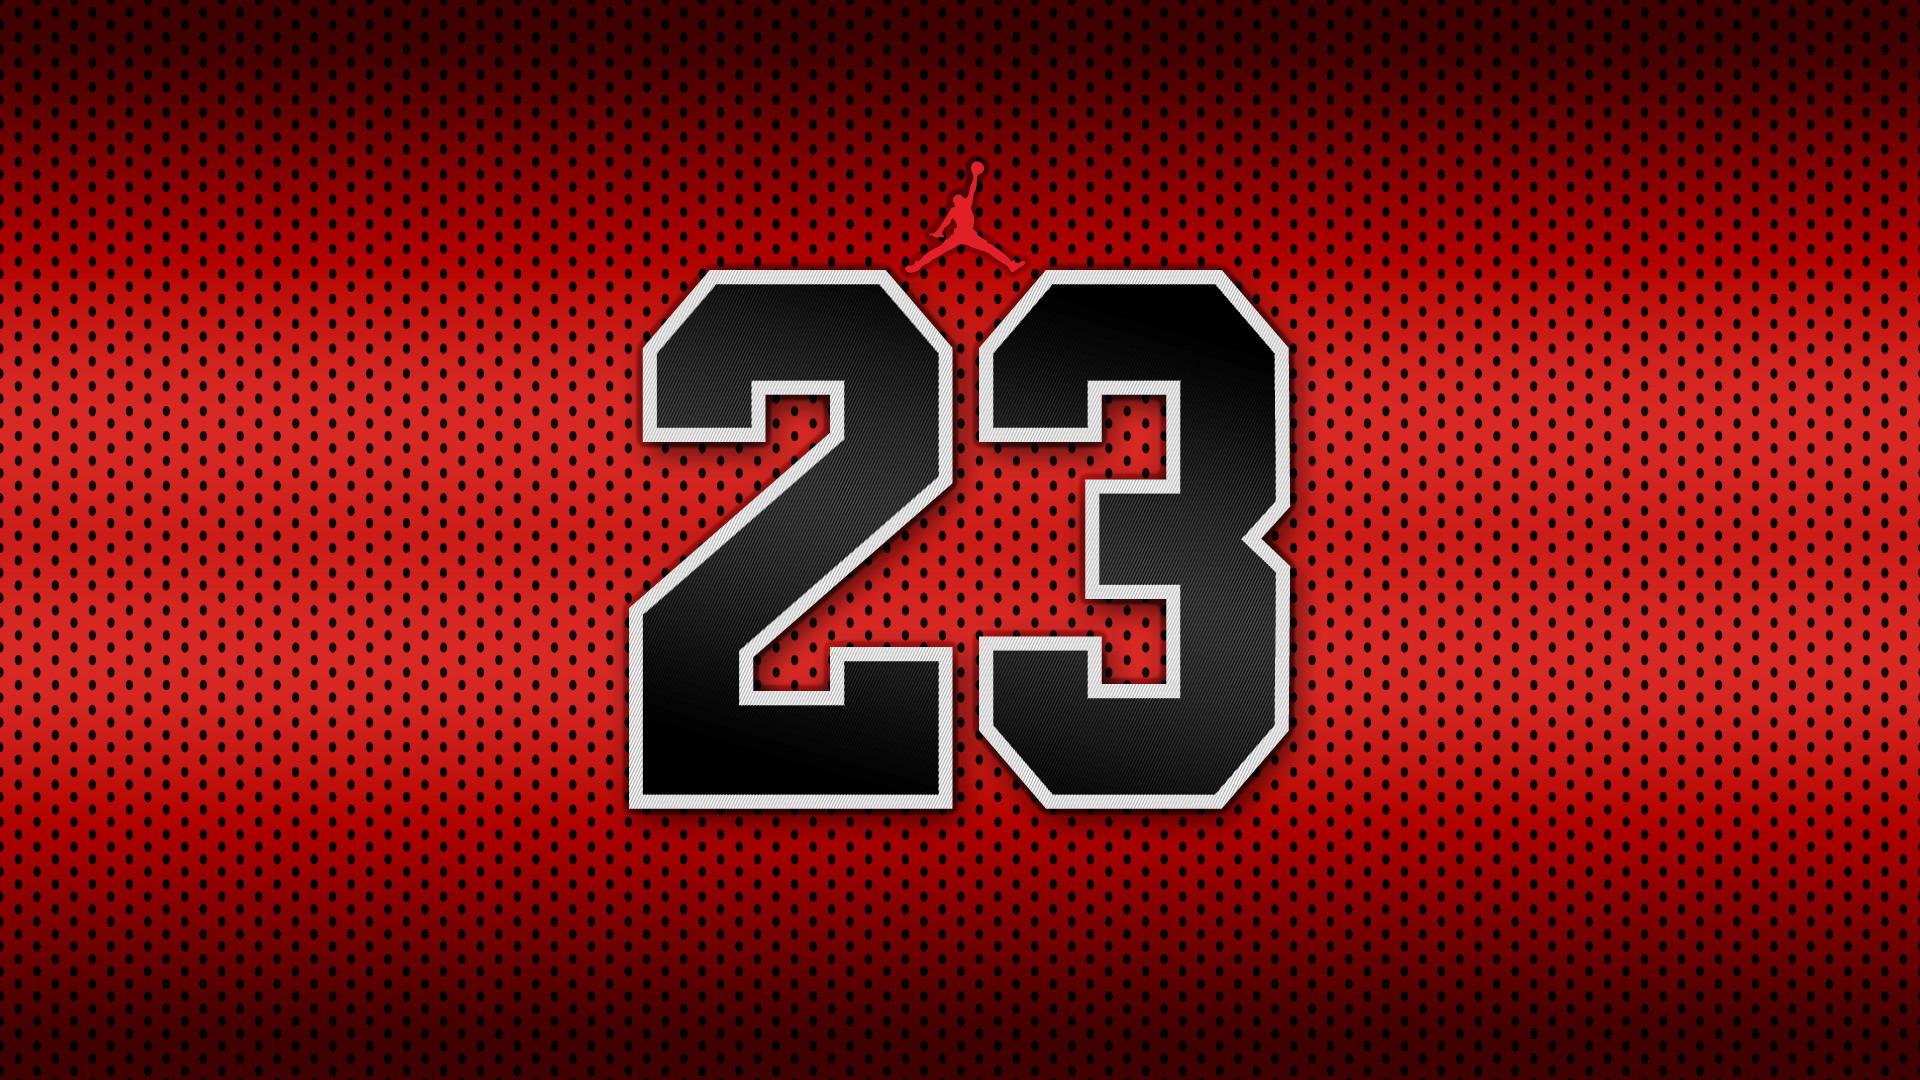 Michael Jordan Chicago Bulls HD Background.